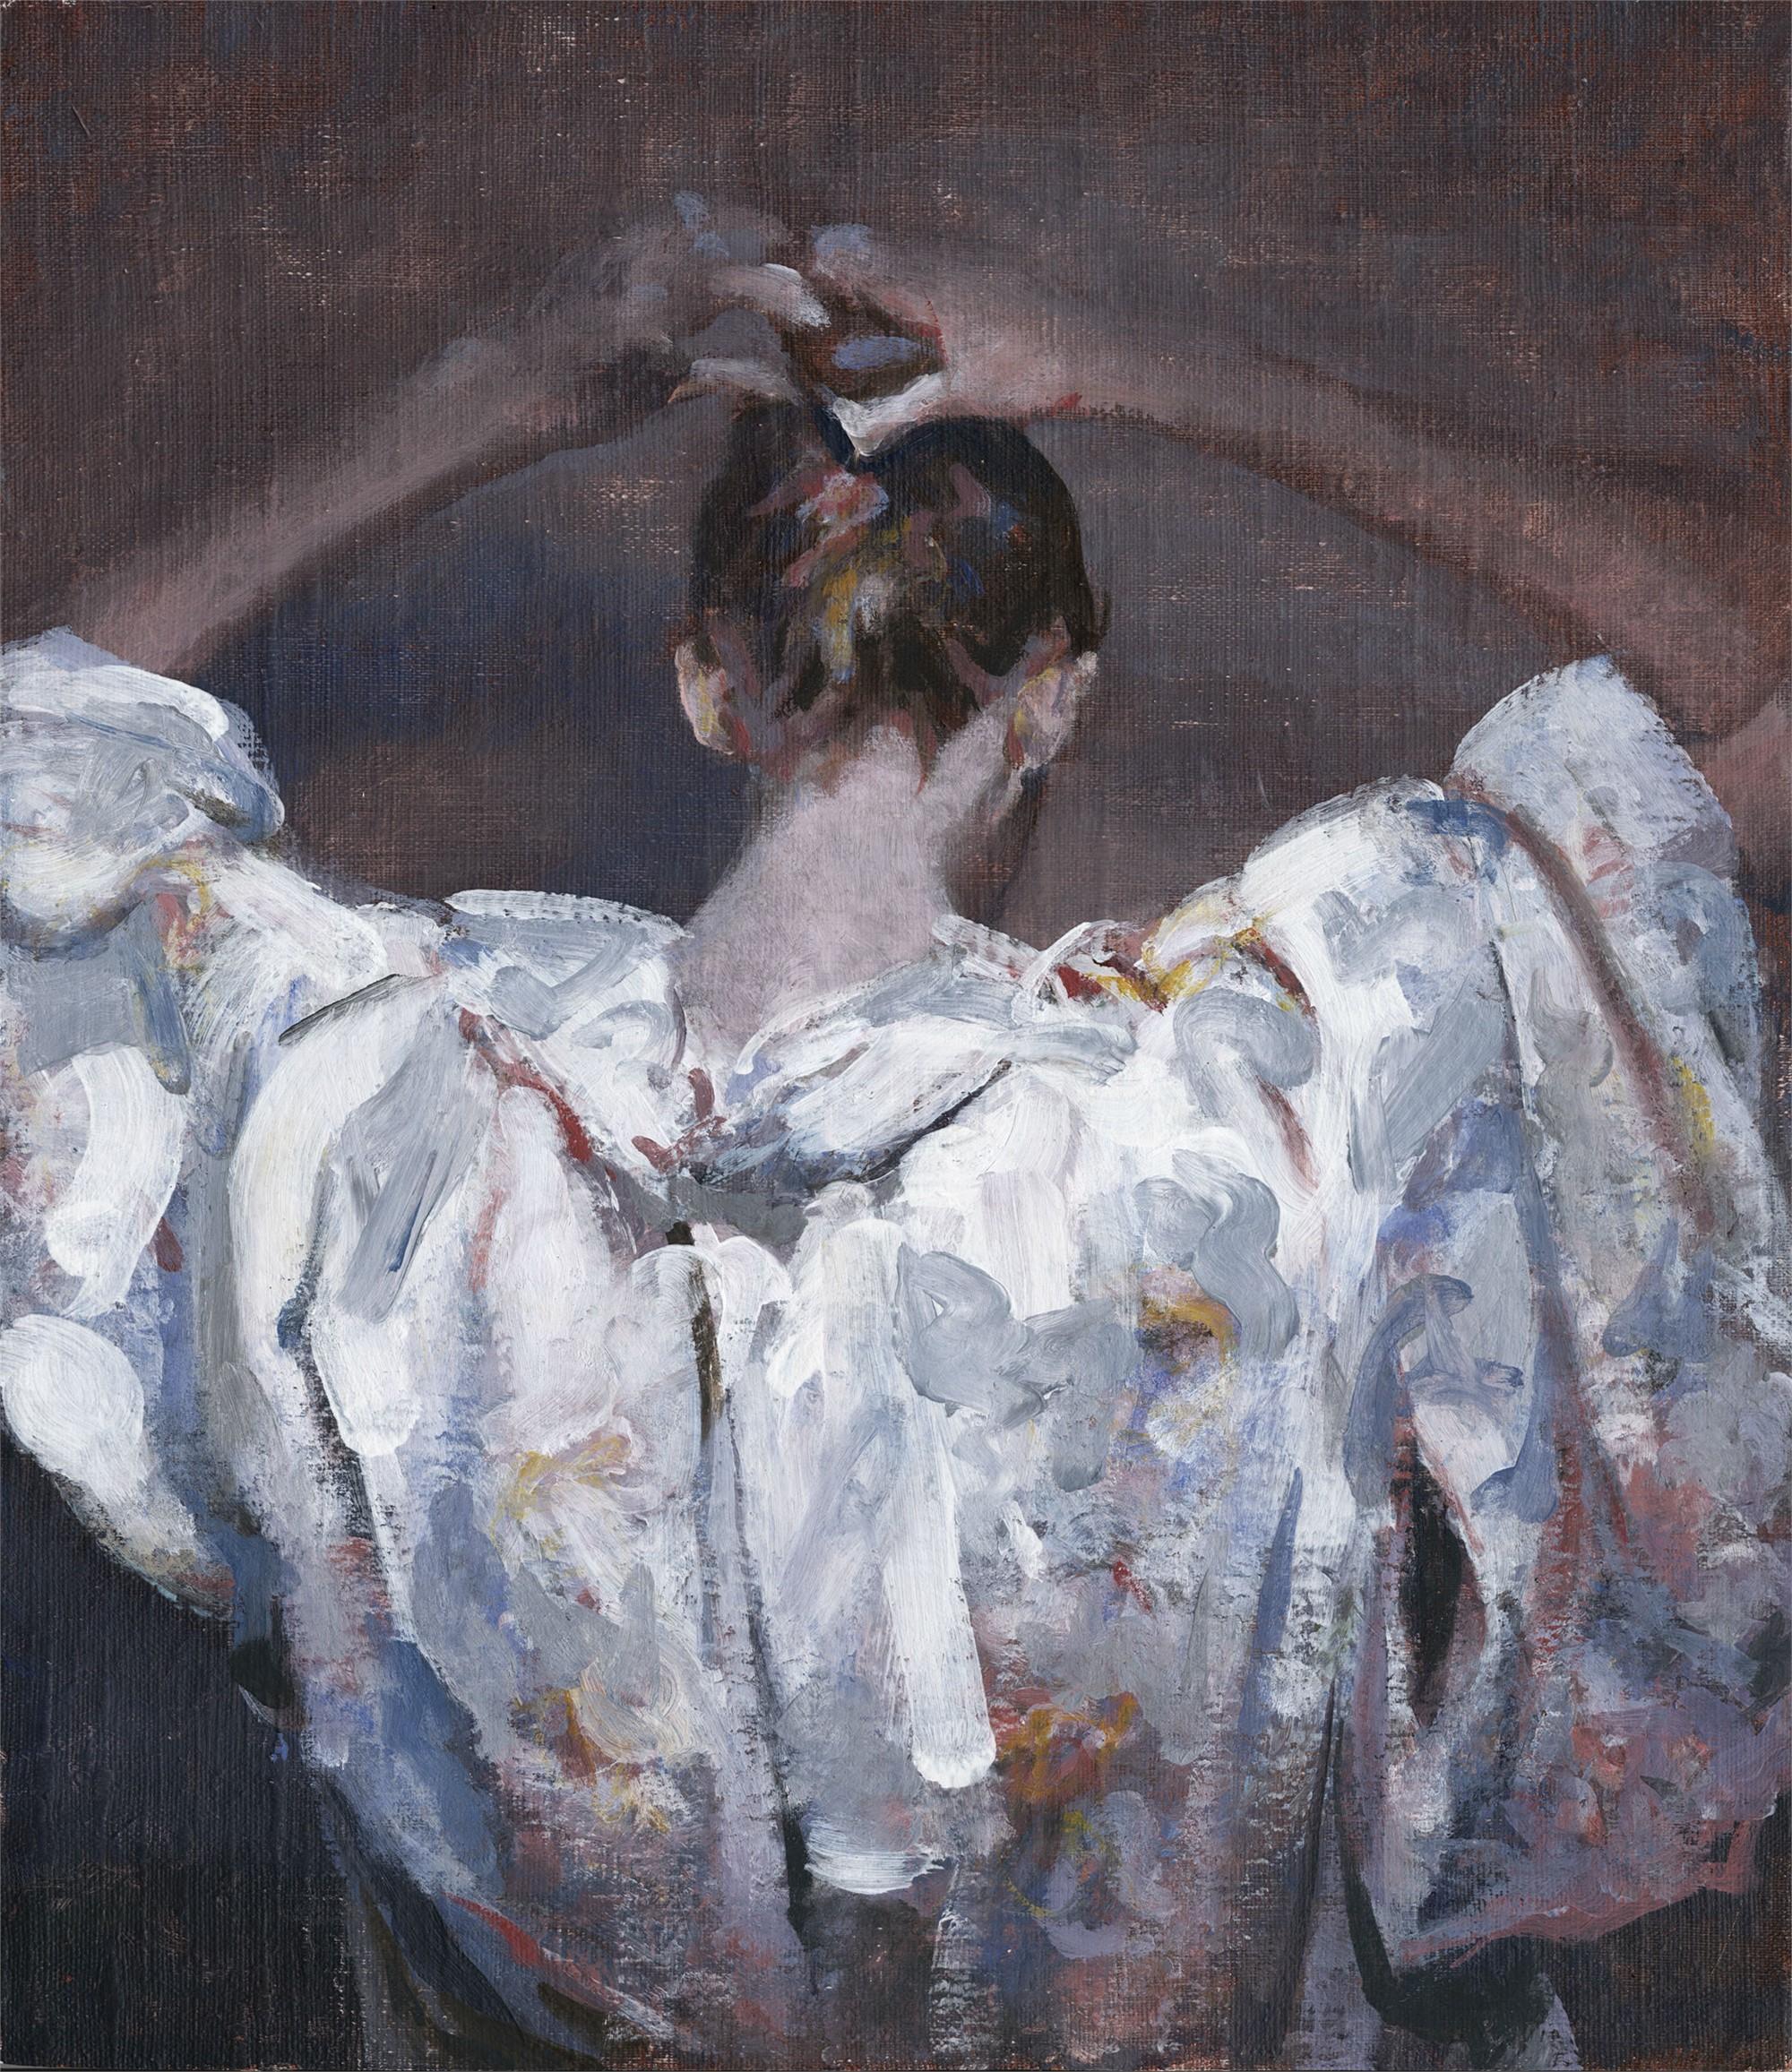 Janice by George Pratt